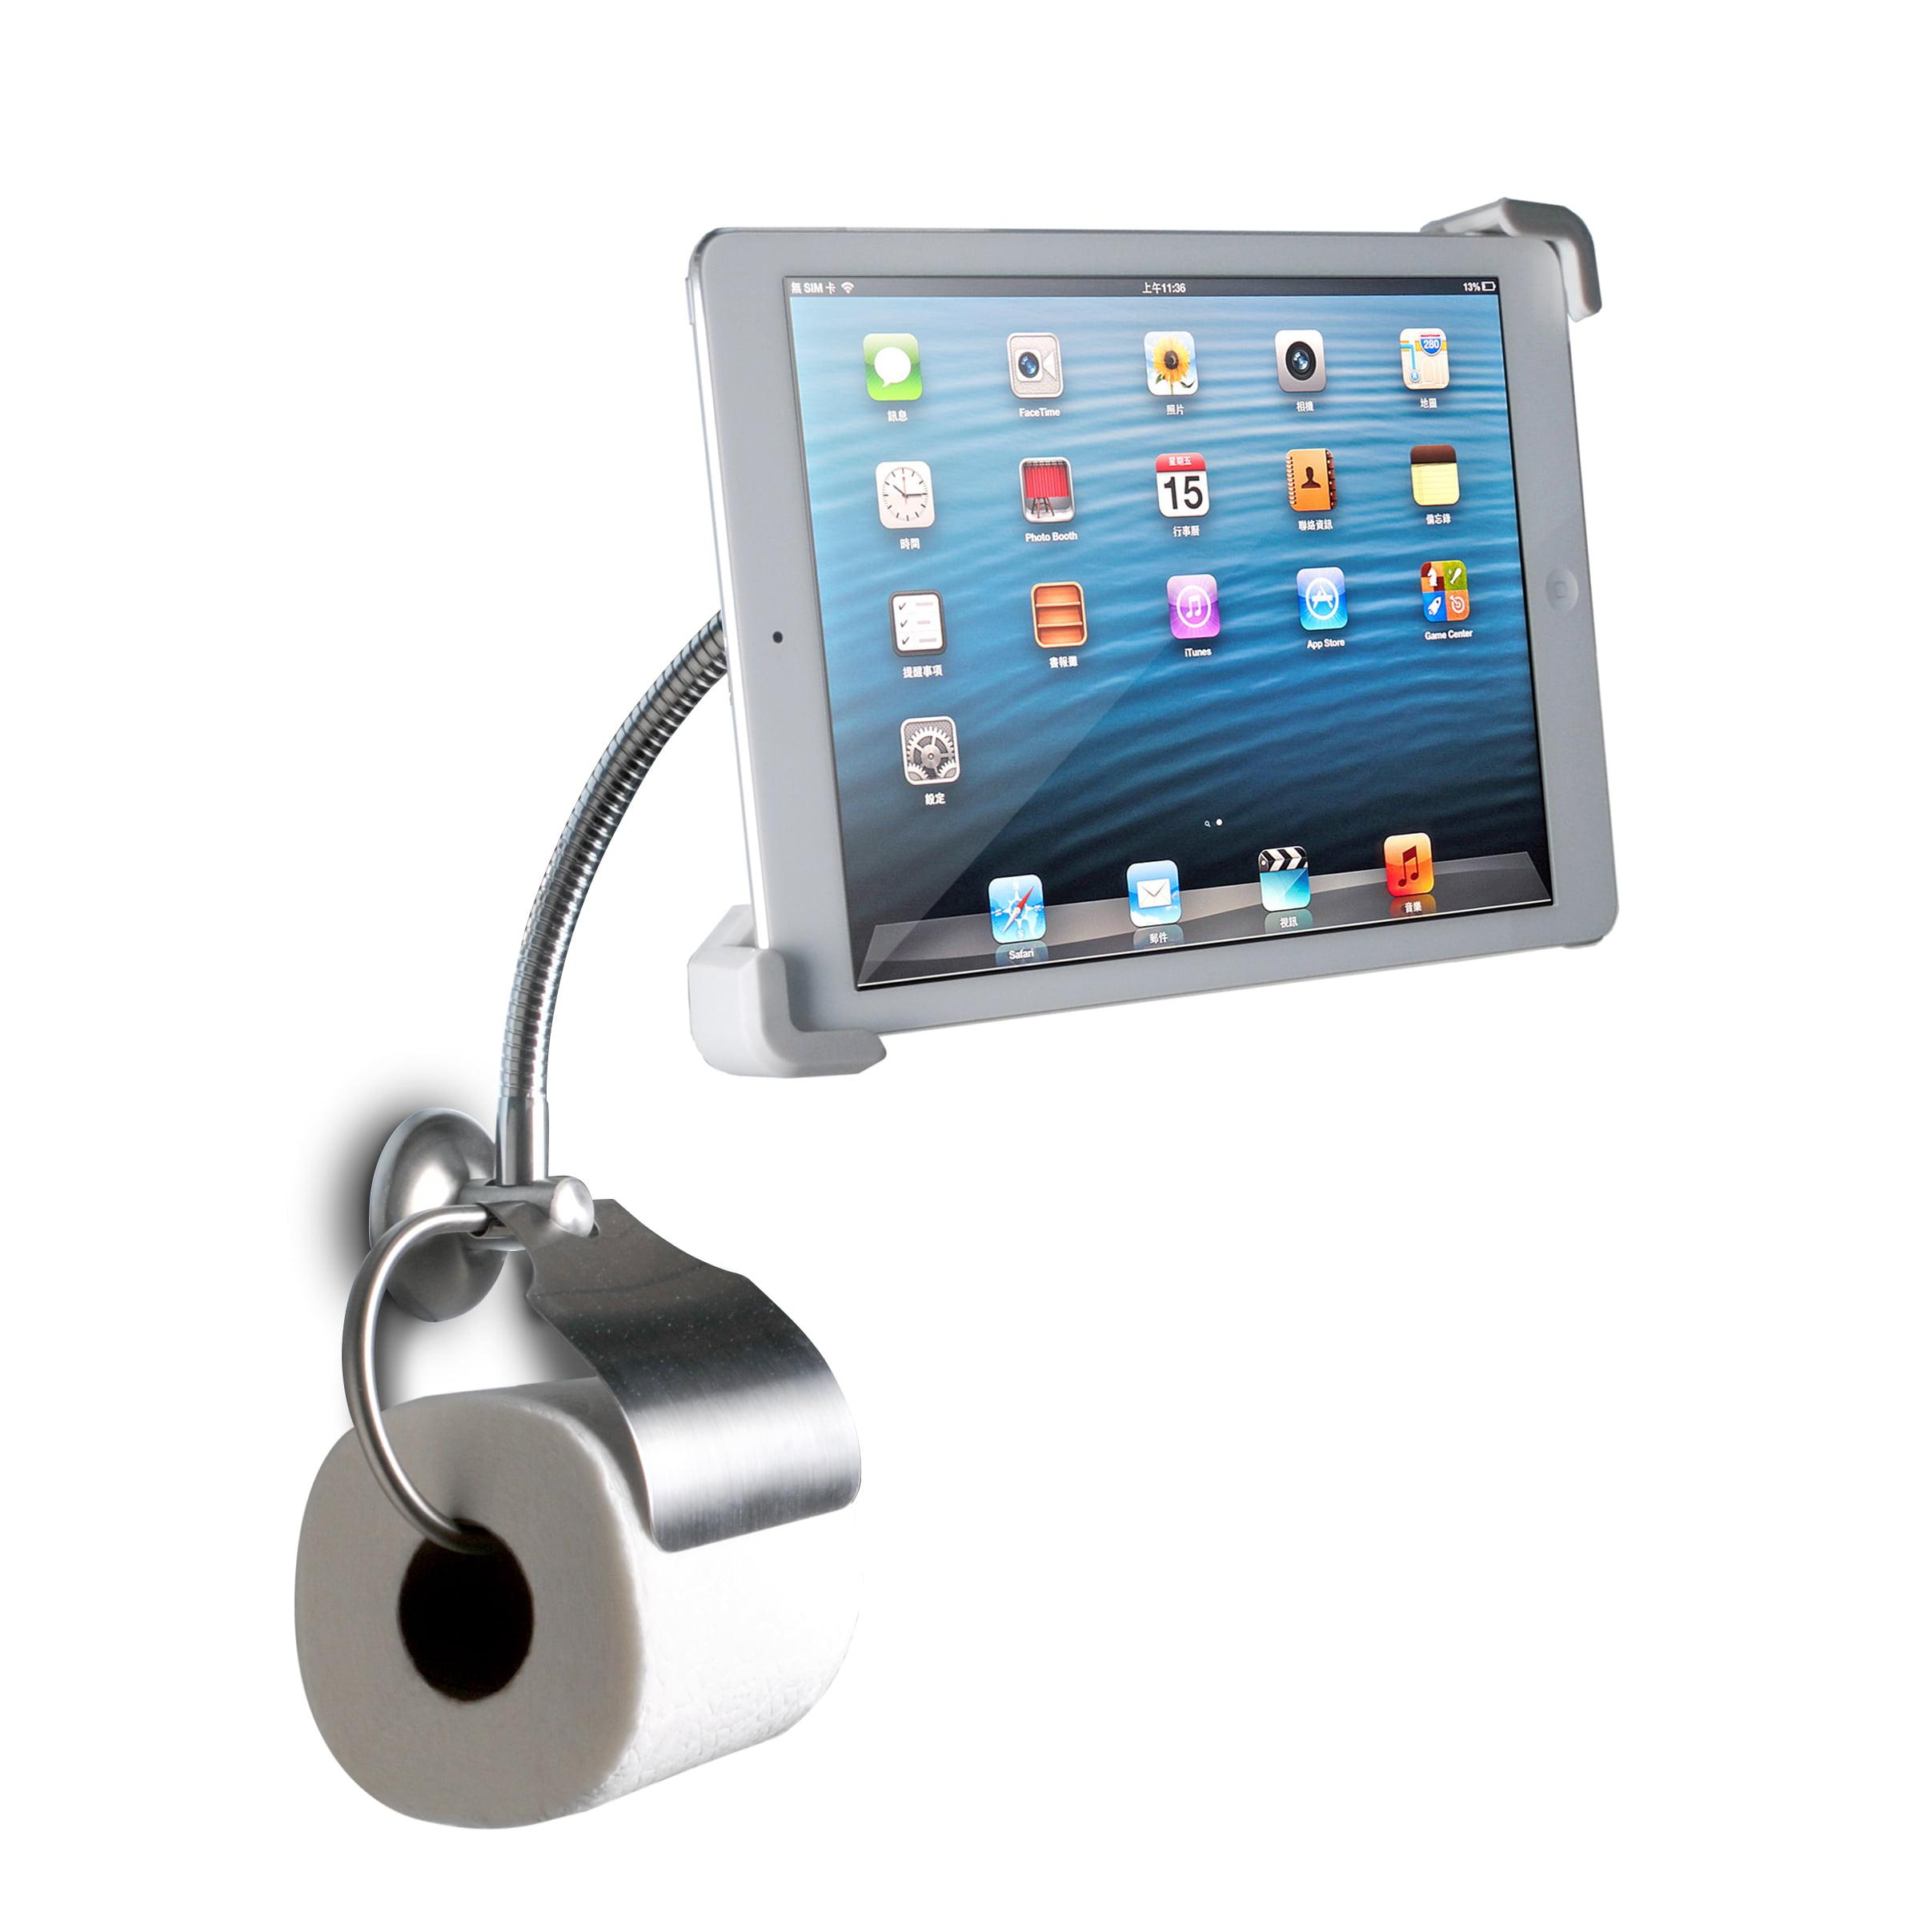 Ipad bathroom wall mount - Ipad Bathroom Wall Mount 7